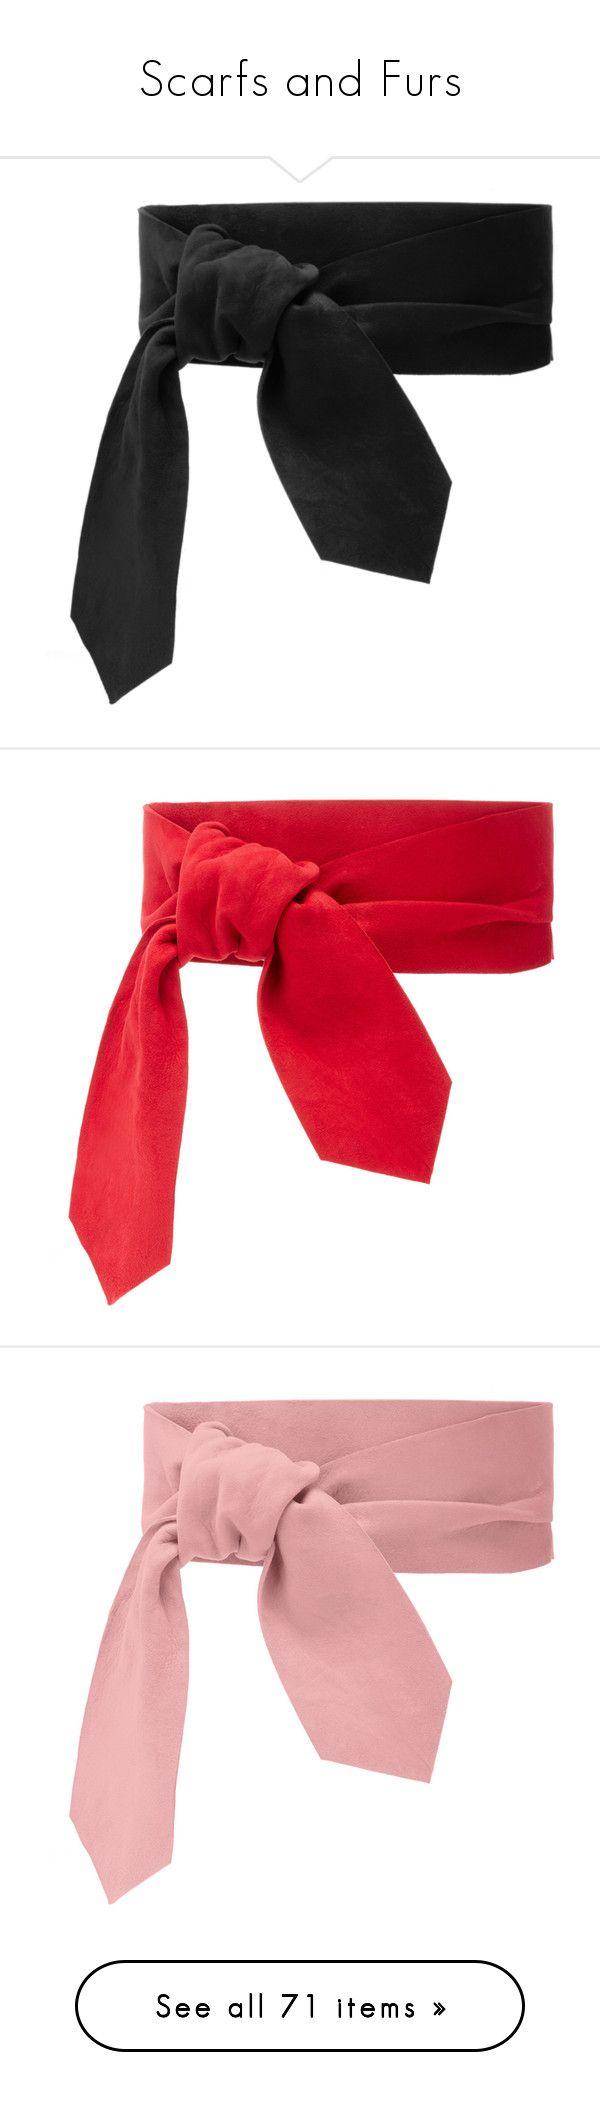 """Scarfs and Furs"" by mssparkleprincess ❤ liked on Polyvore featuring accessories, belts, knot belt, wrap belt, suede belt, slimming belt, scarves, collar, fur and pink ribbon scarves"